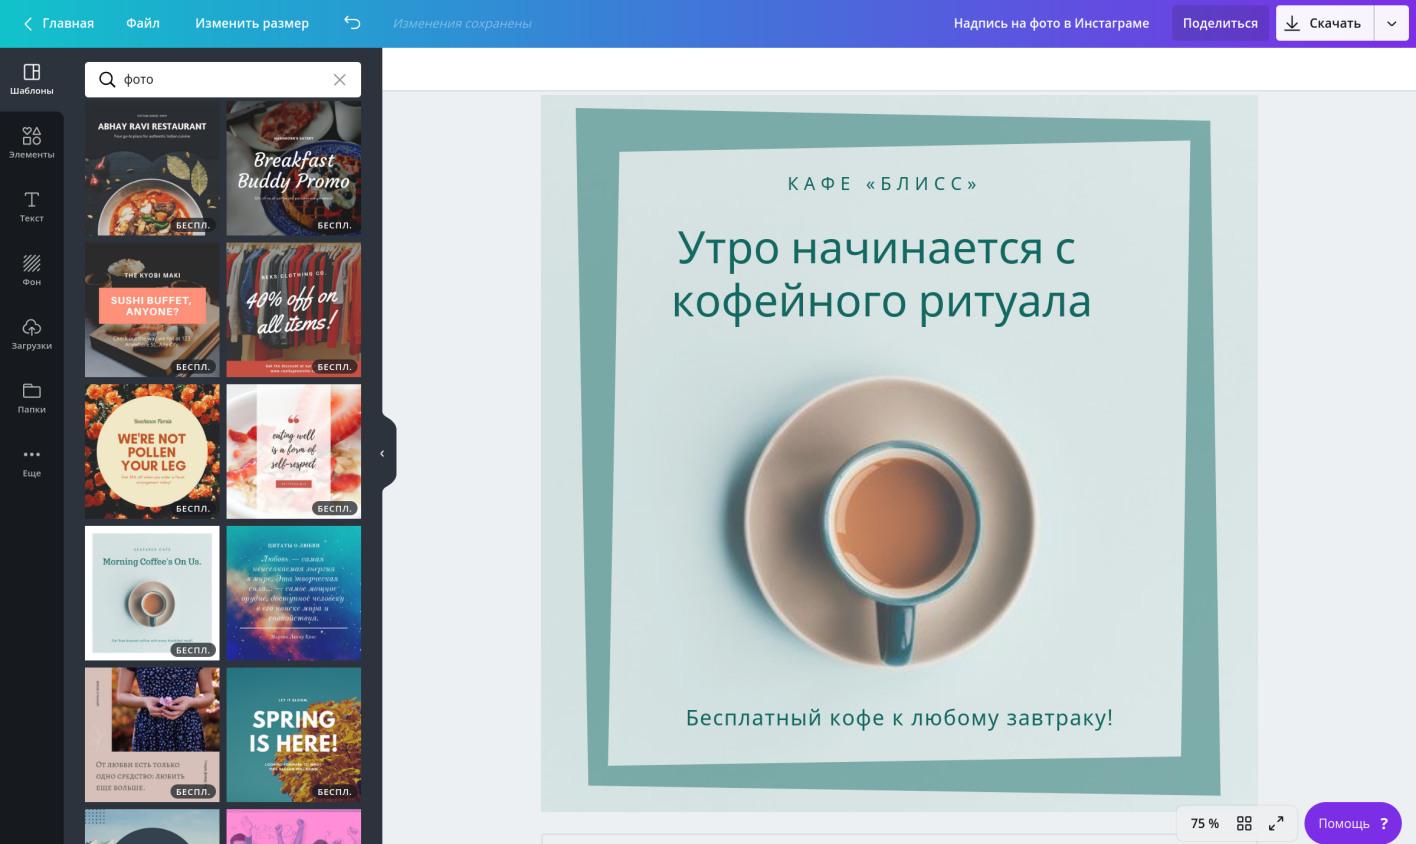 Добавление текста на фото для Инстаграма в редакторе на русском языке Canva